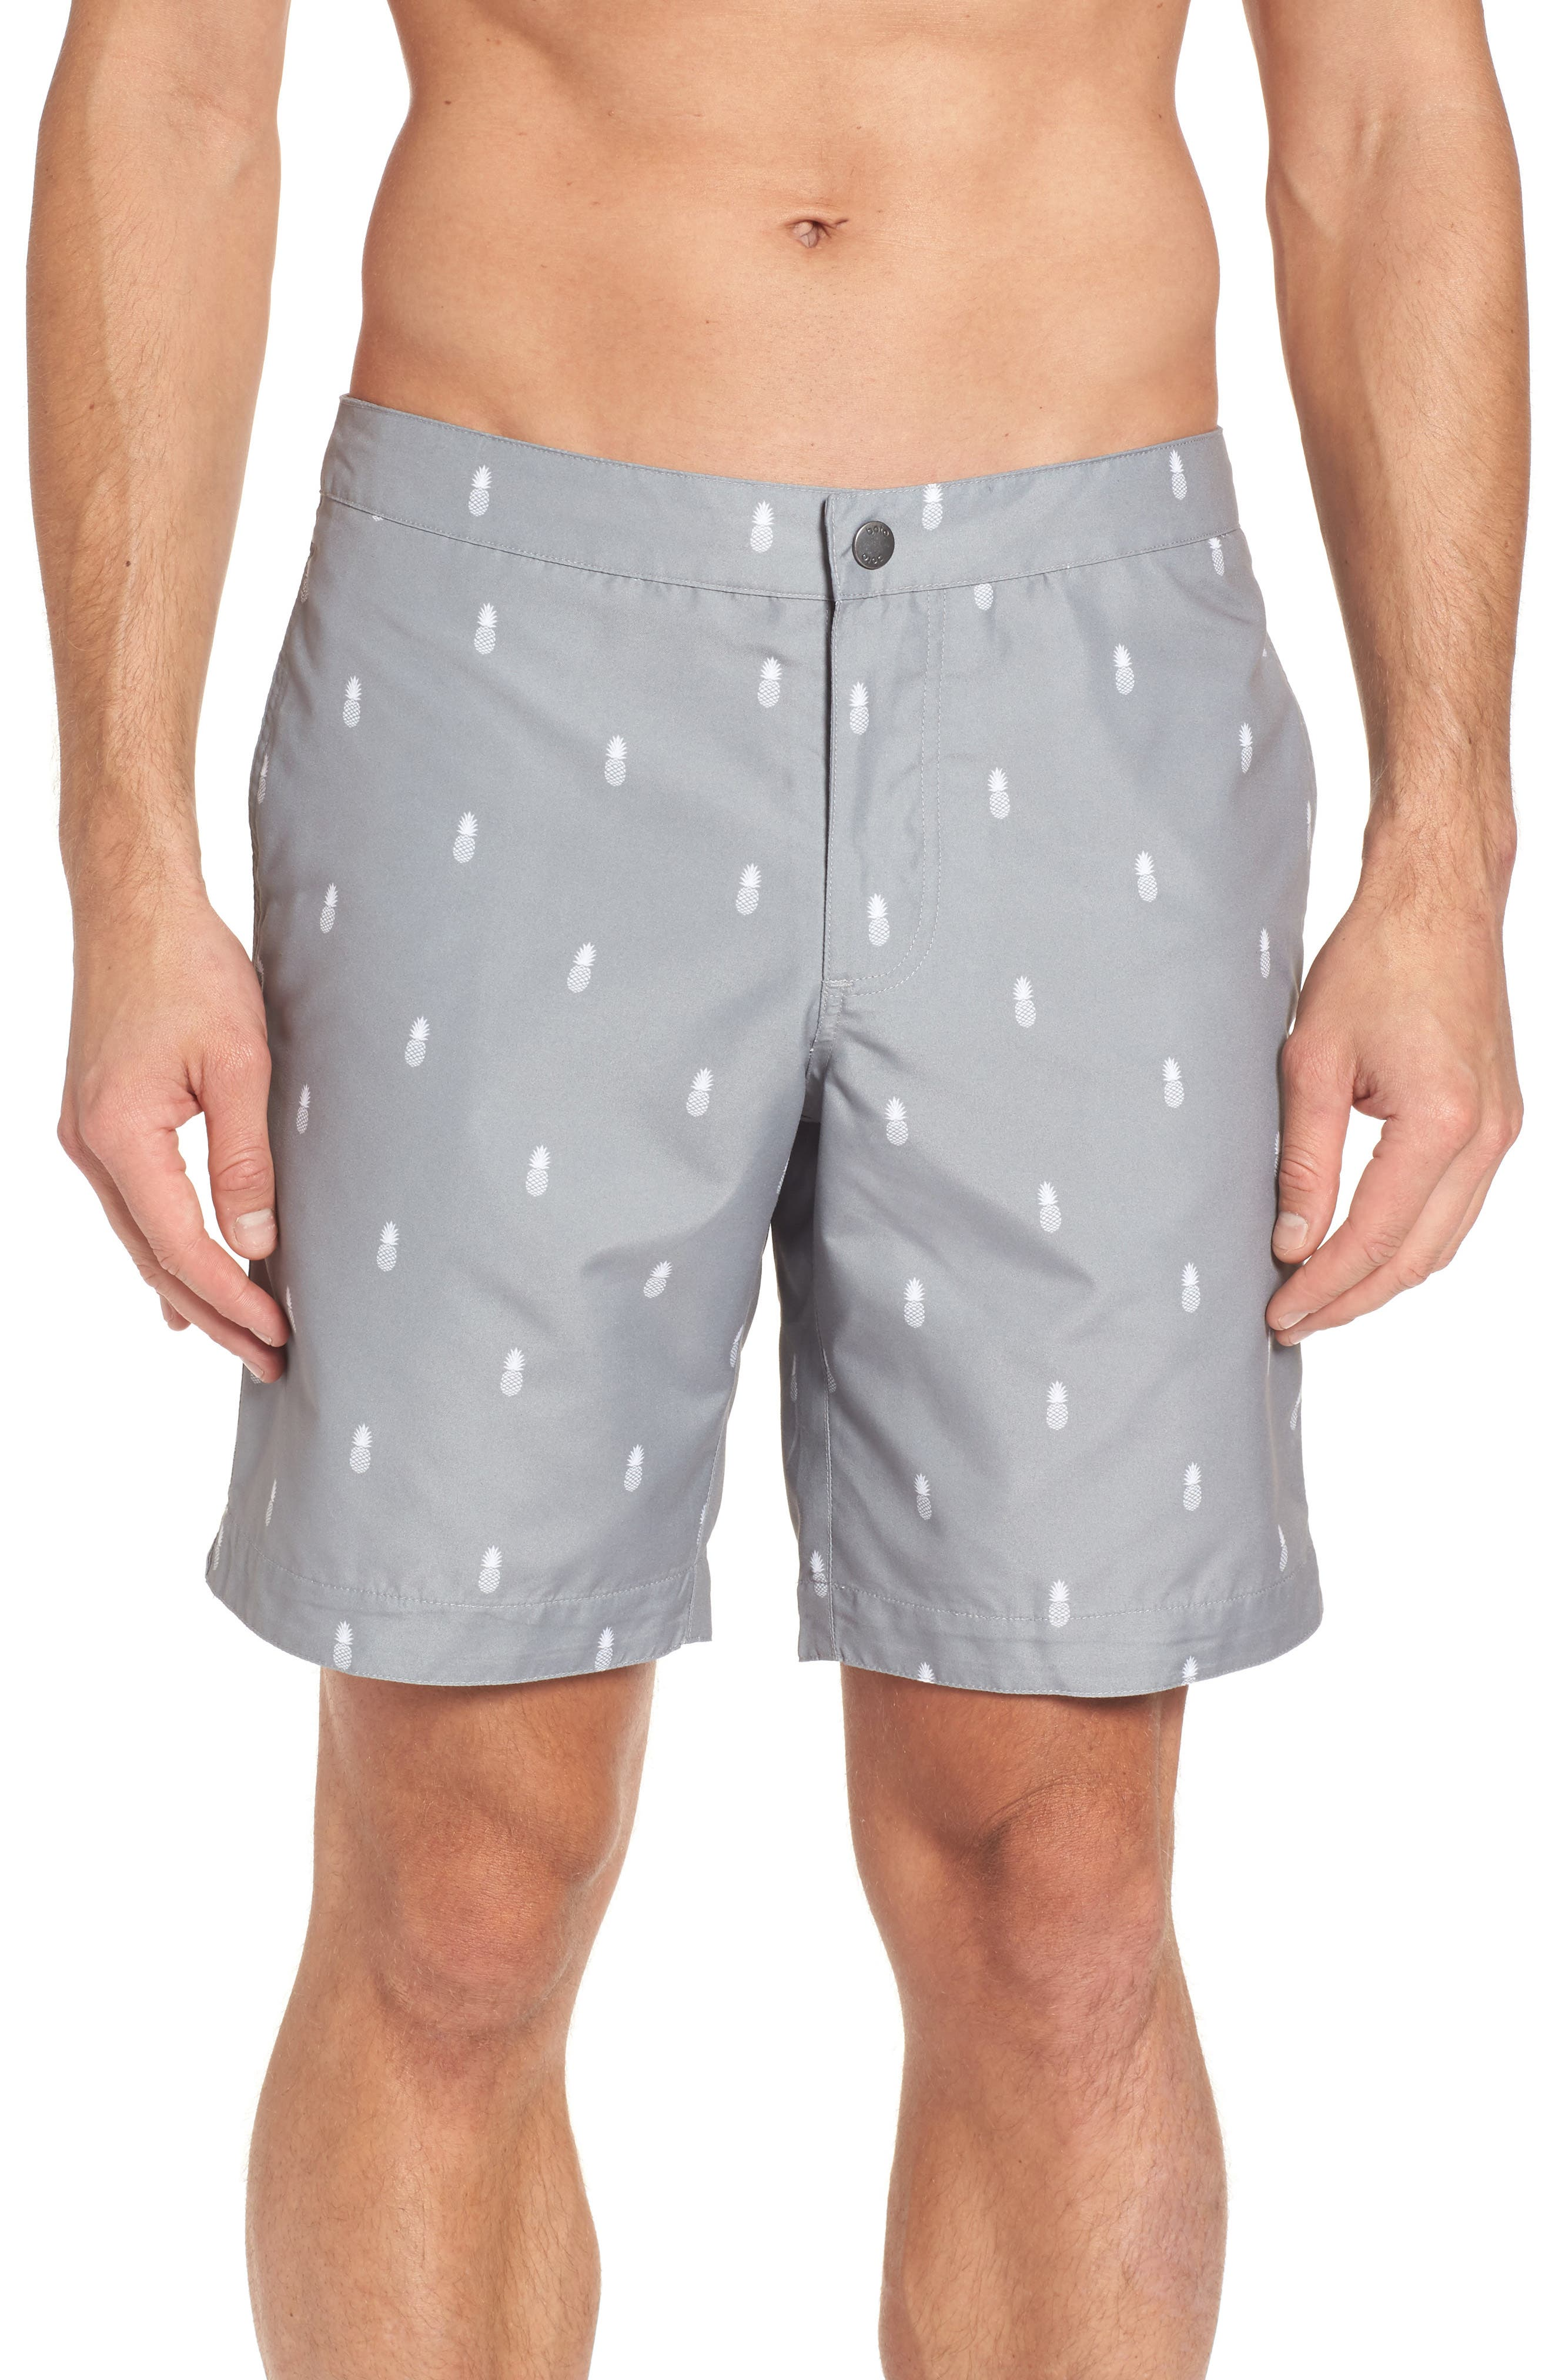 Alternate Image 1 Selected - boto Aruba Tailored Fit Swim Trunks